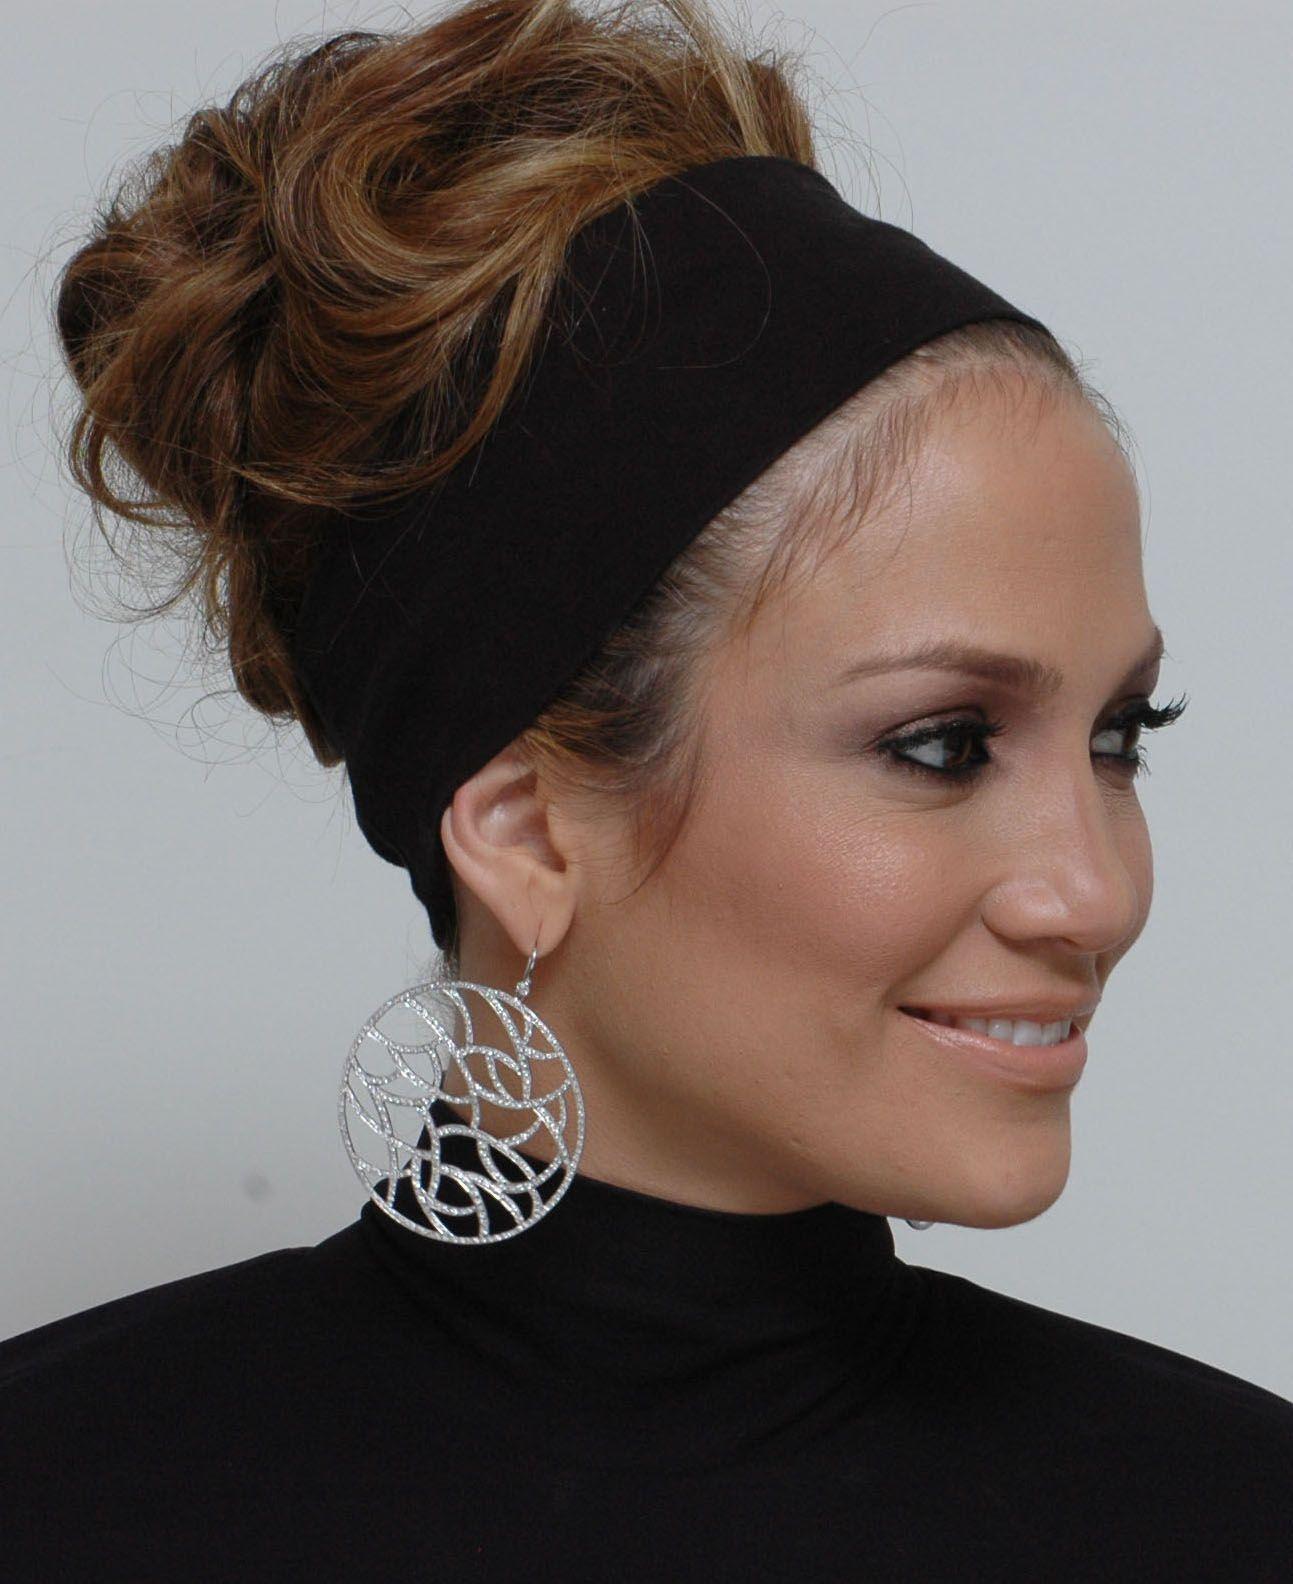 wide-how-to-style-hair-accessories-headbands-hairstyles-ways-to-wear-jenniferlopez-updo-black.jpg